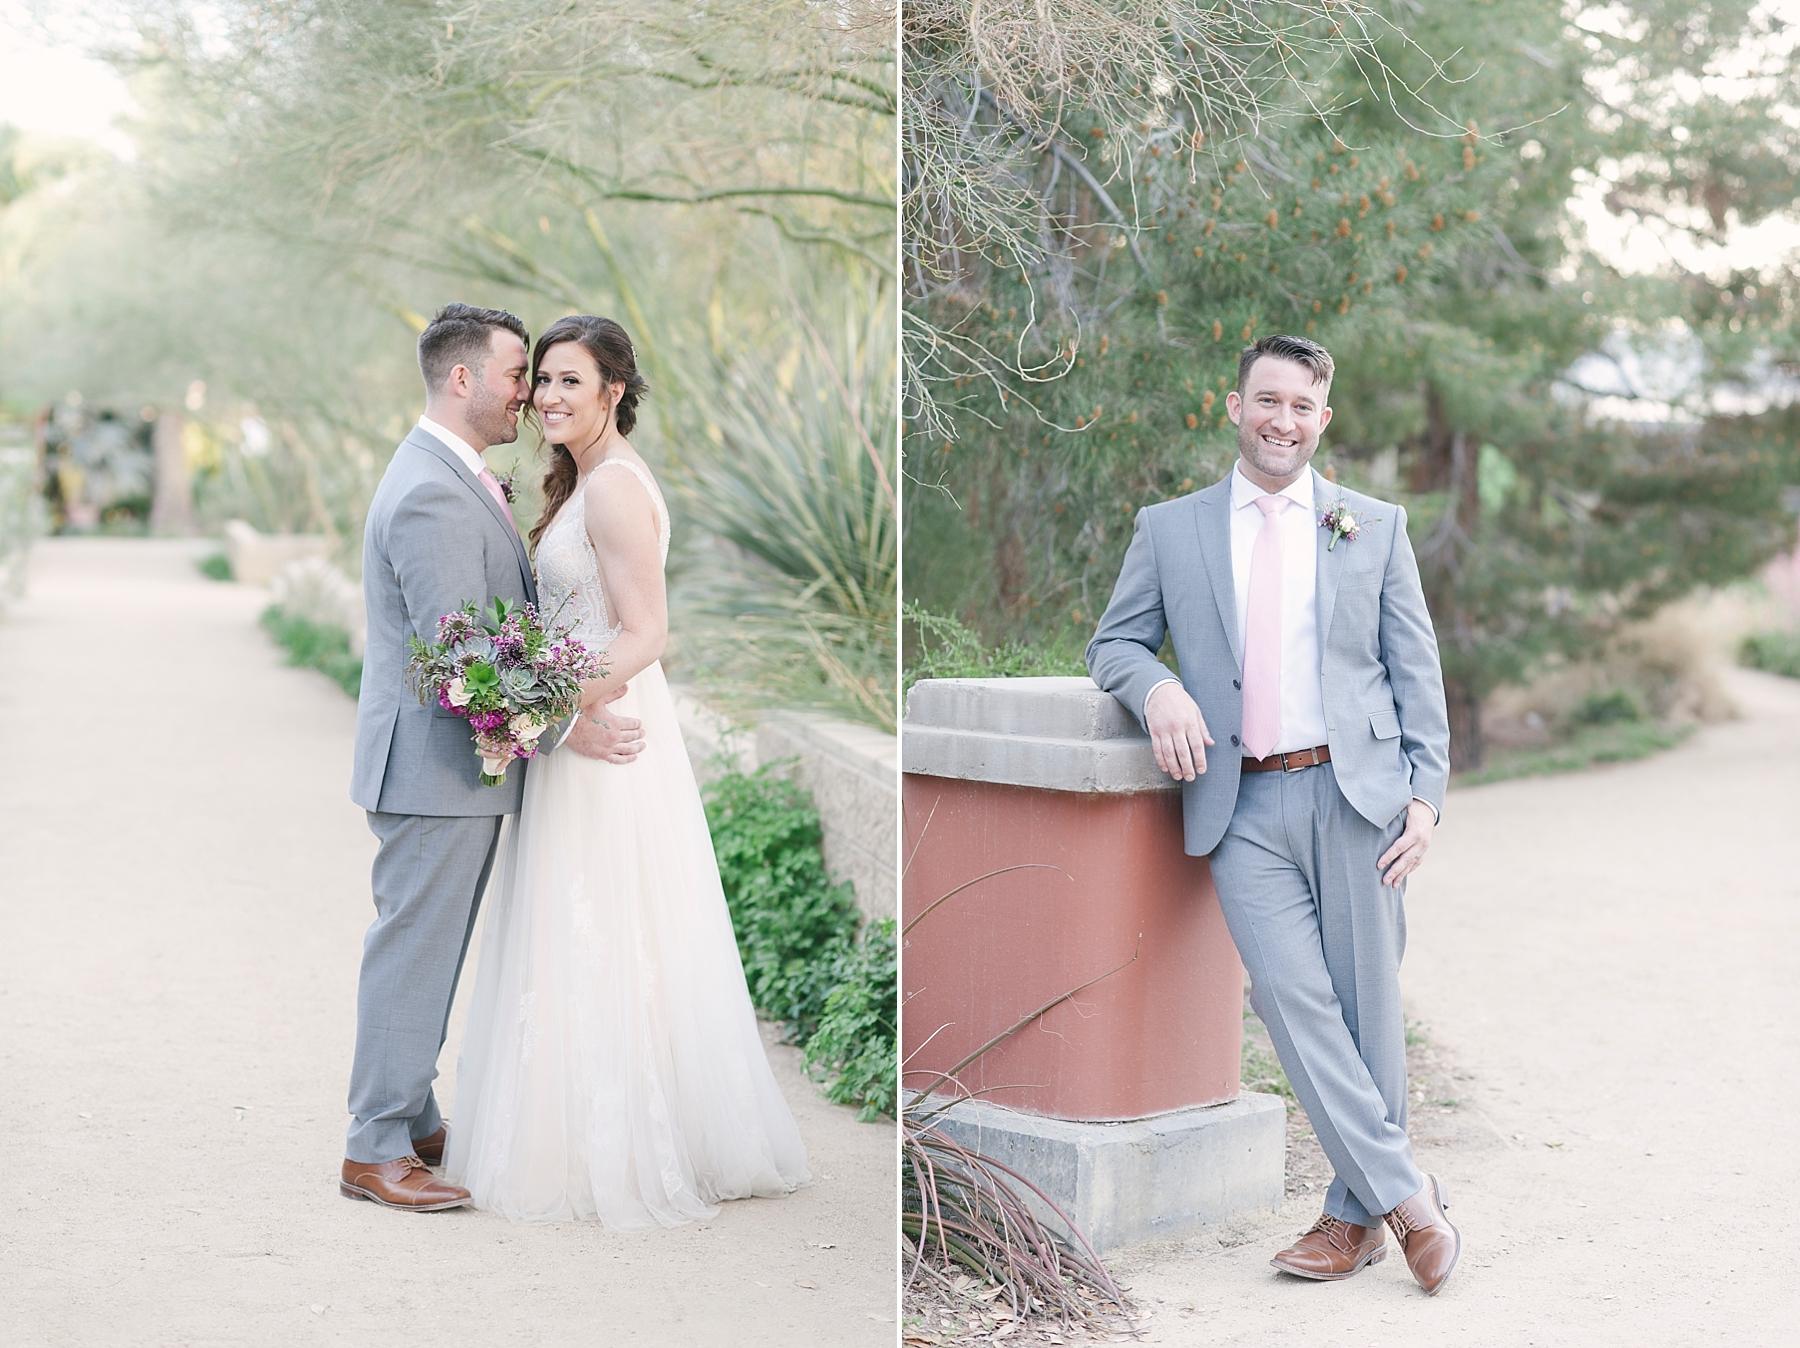 springs-preserve-wedding-las-vegas-destination-photography-the-emerics-42.jpg